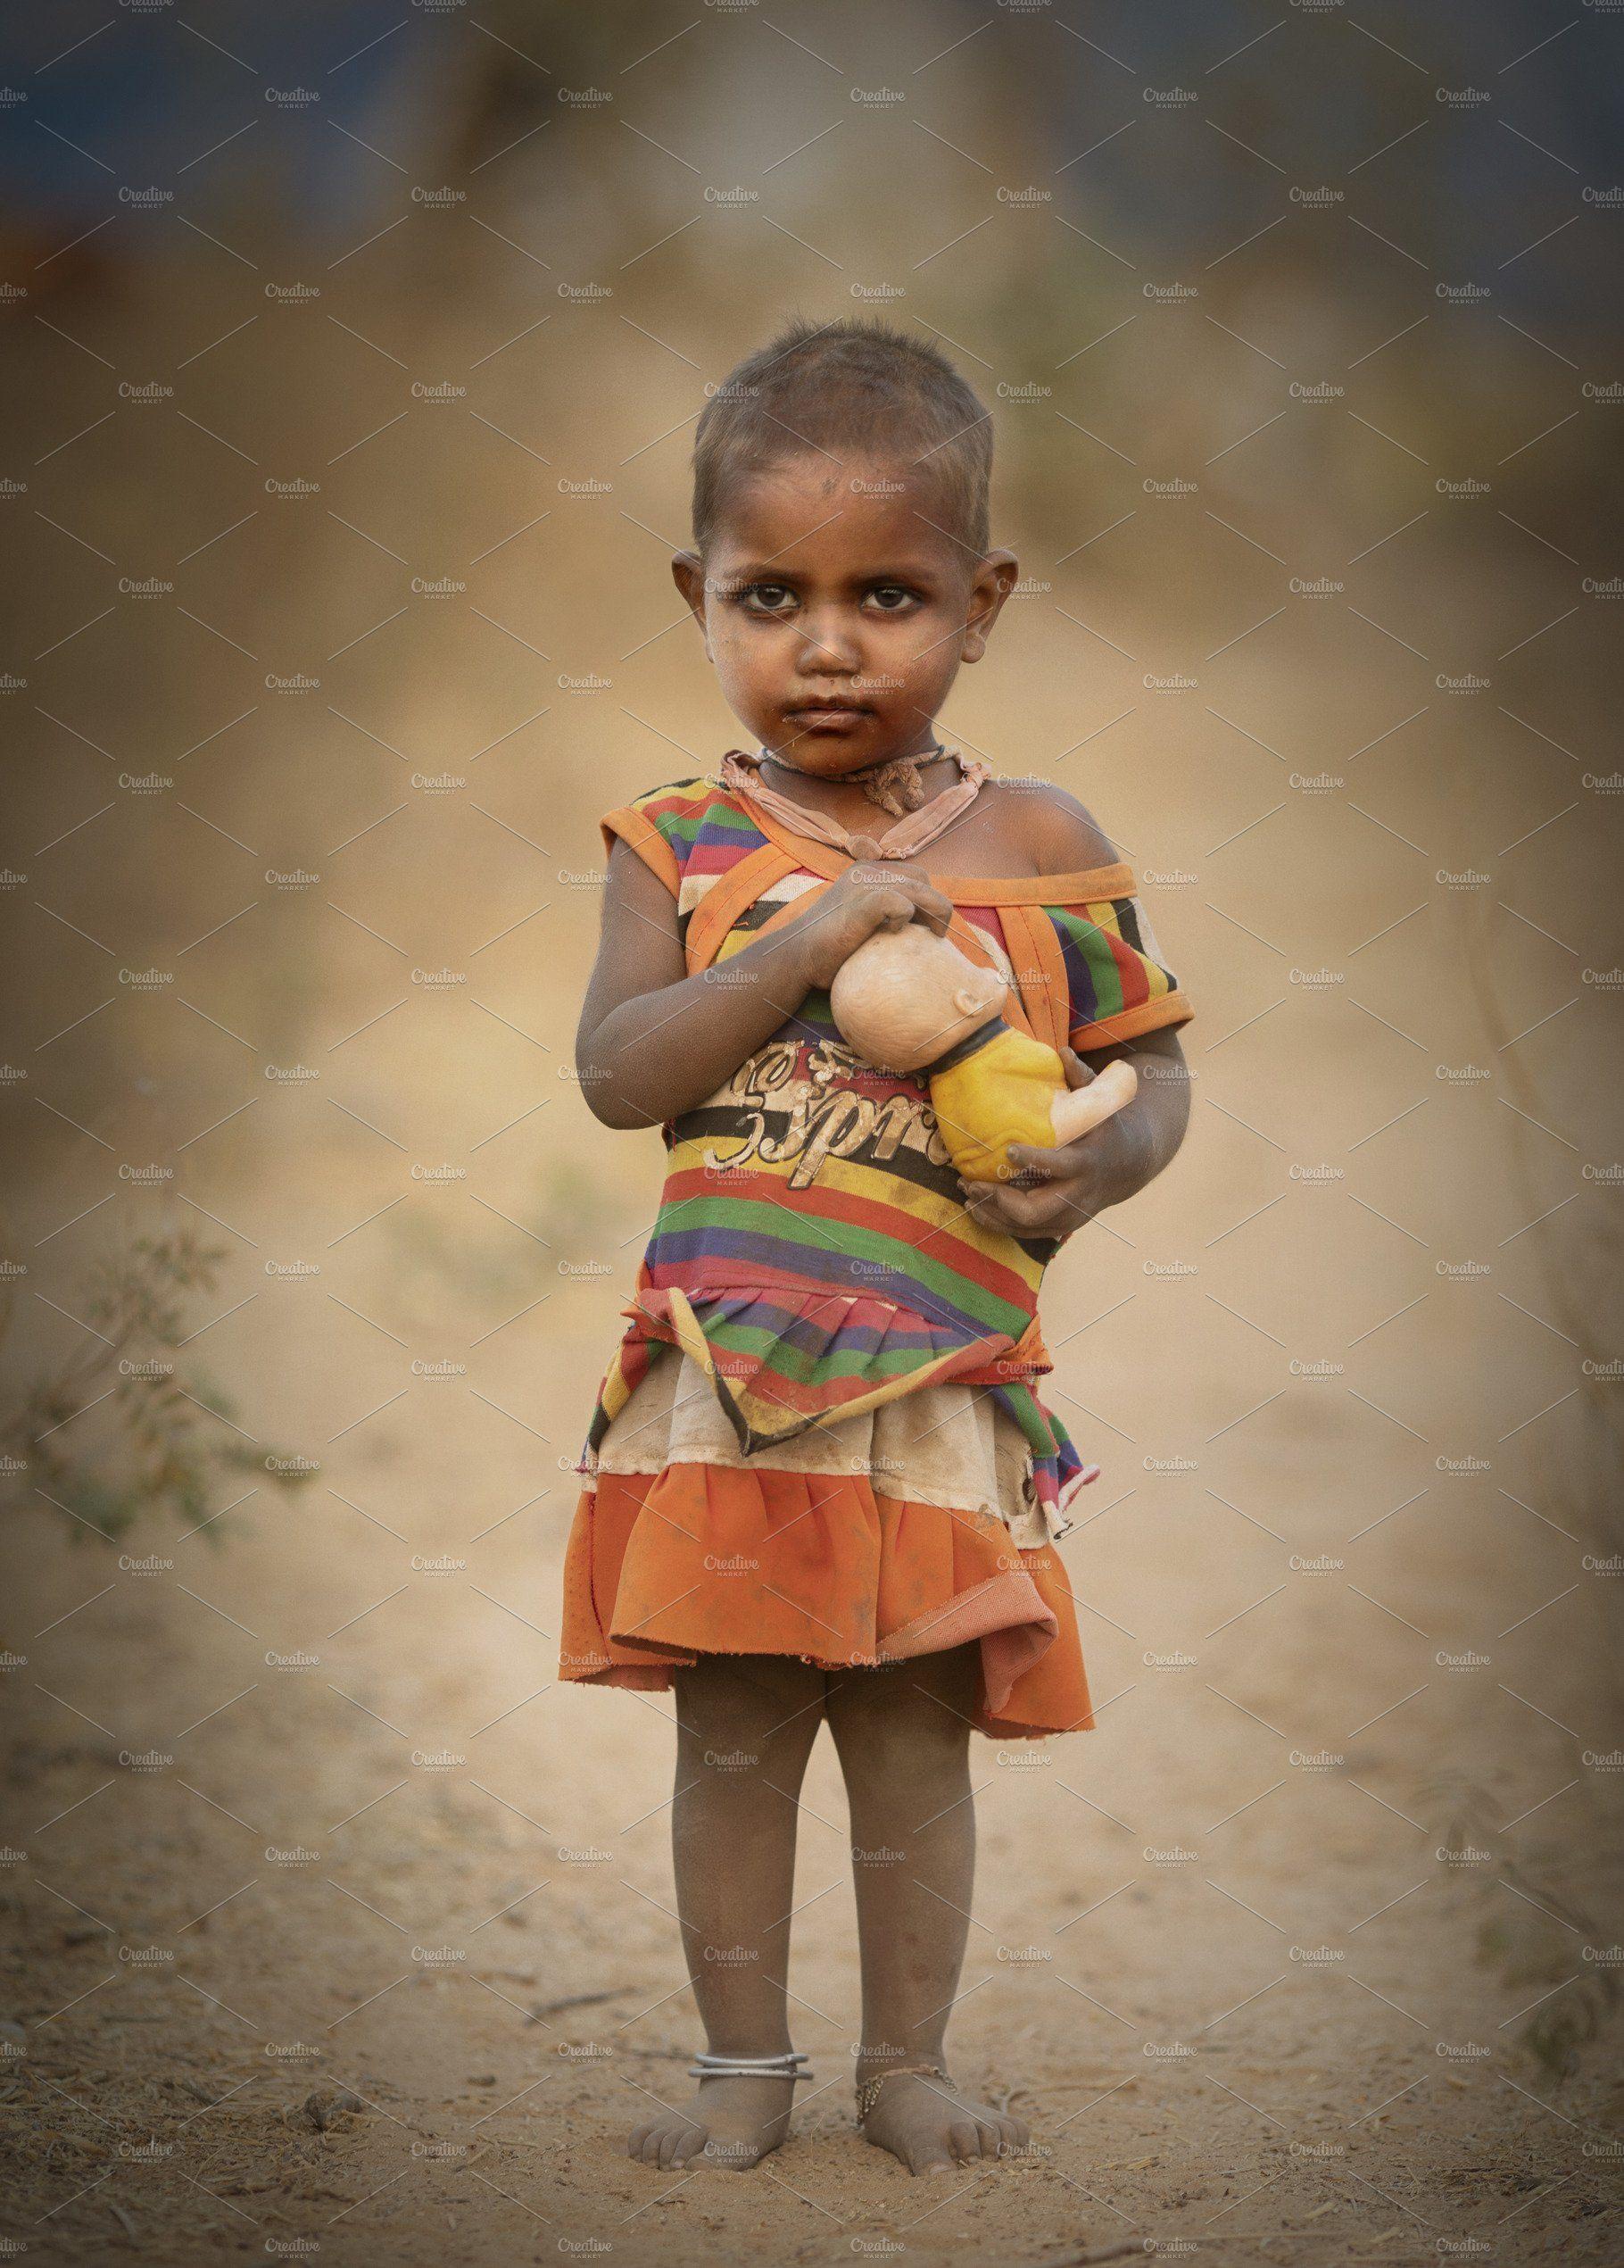 Indian Poverty Little Girl Little Girls Poverty Girls Play